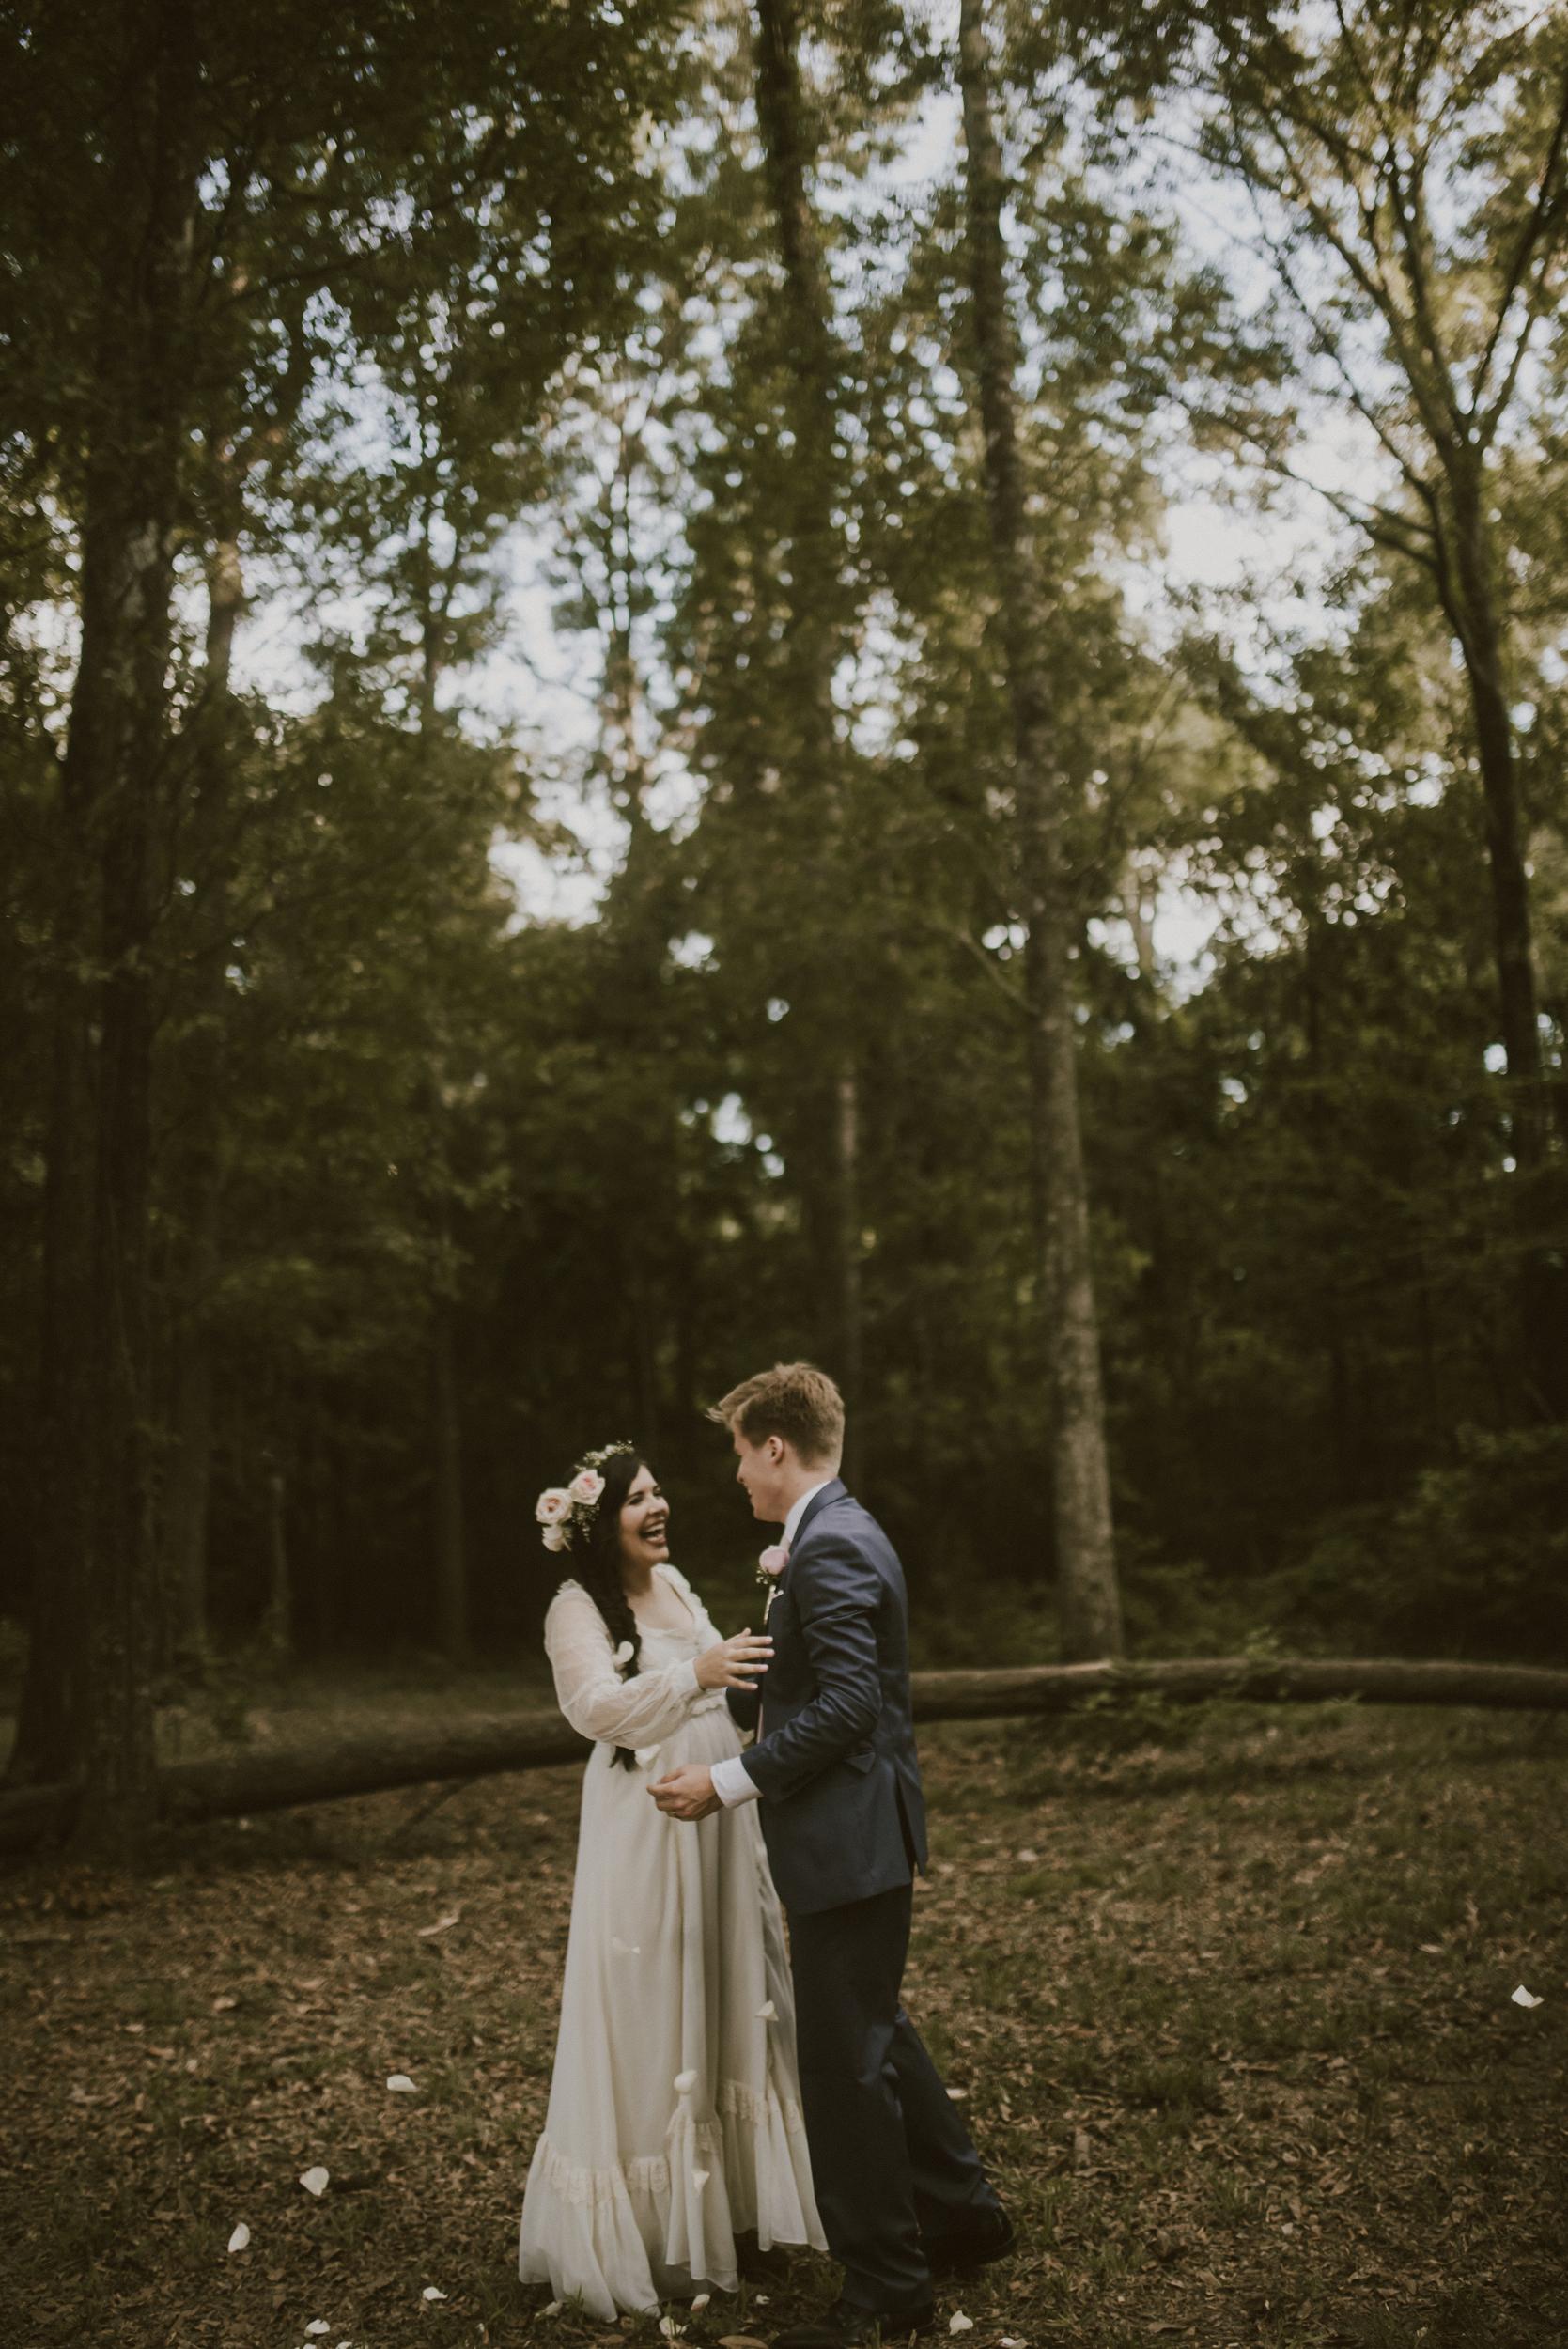 ofRen_weddingphotographer-144.jpg